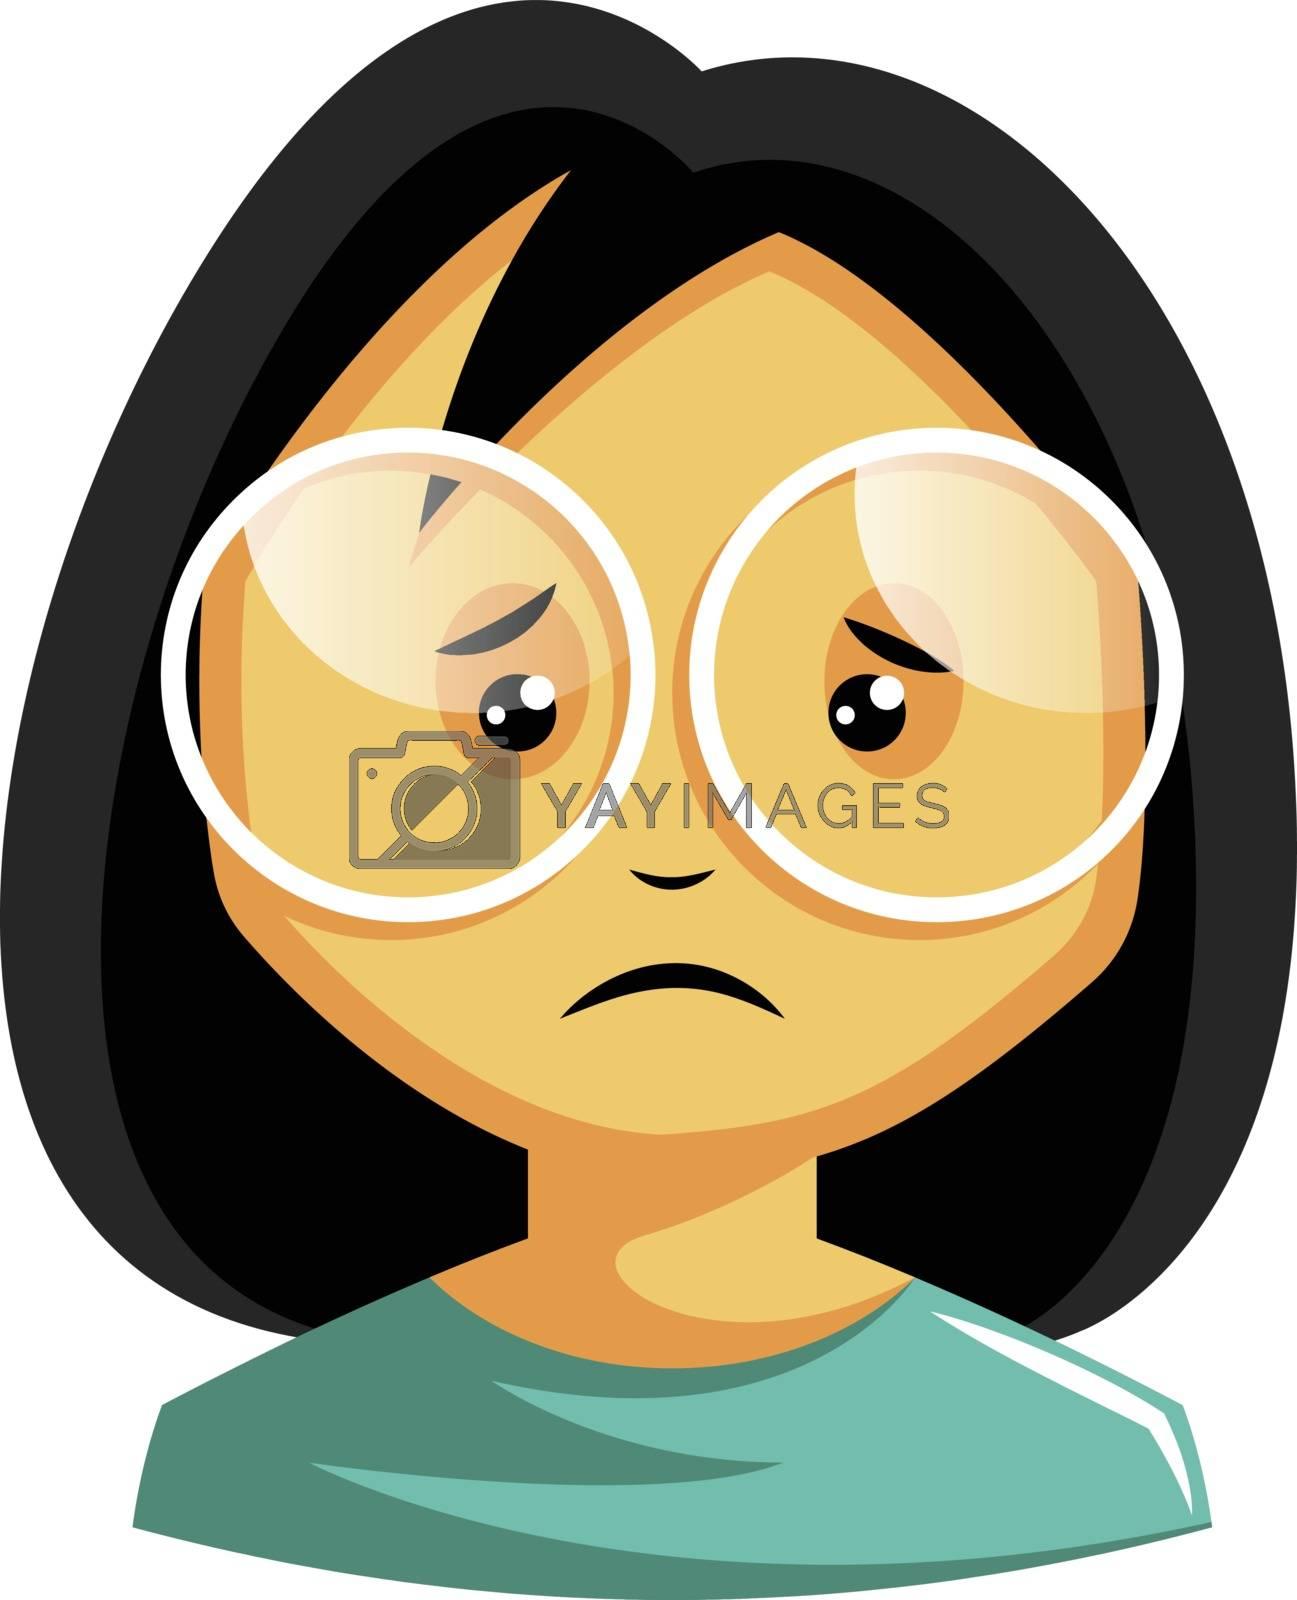 Royalty free image of Girl wearing white glasses is feeling emotional illustration vec by Morphart